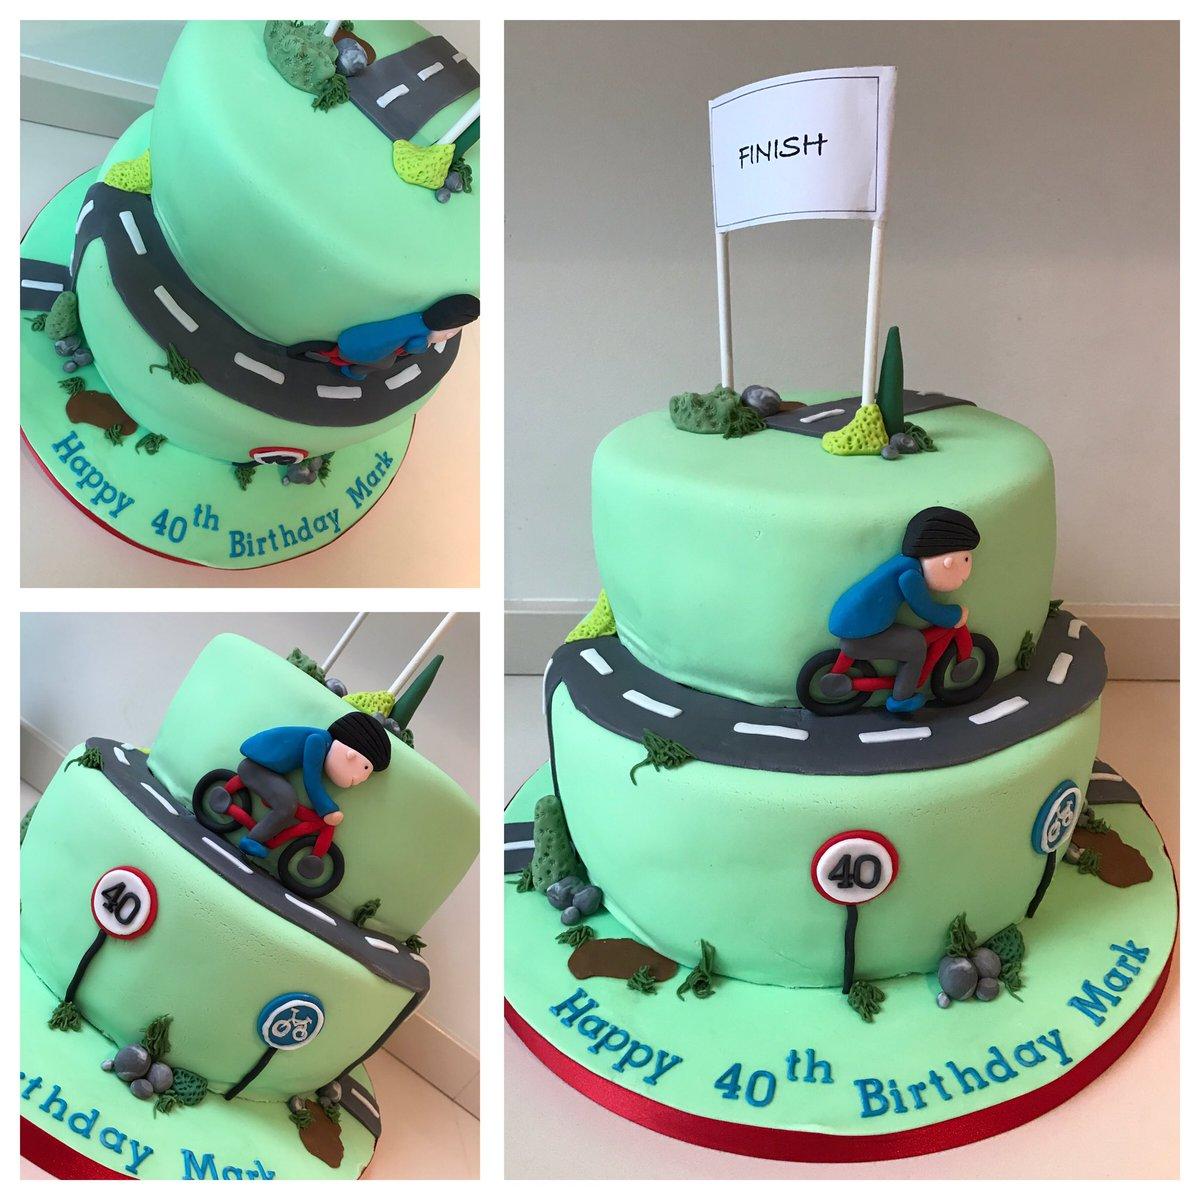 Rachel On Twitter Happy 40th Mark Cyclist Birthday Cake Urmston